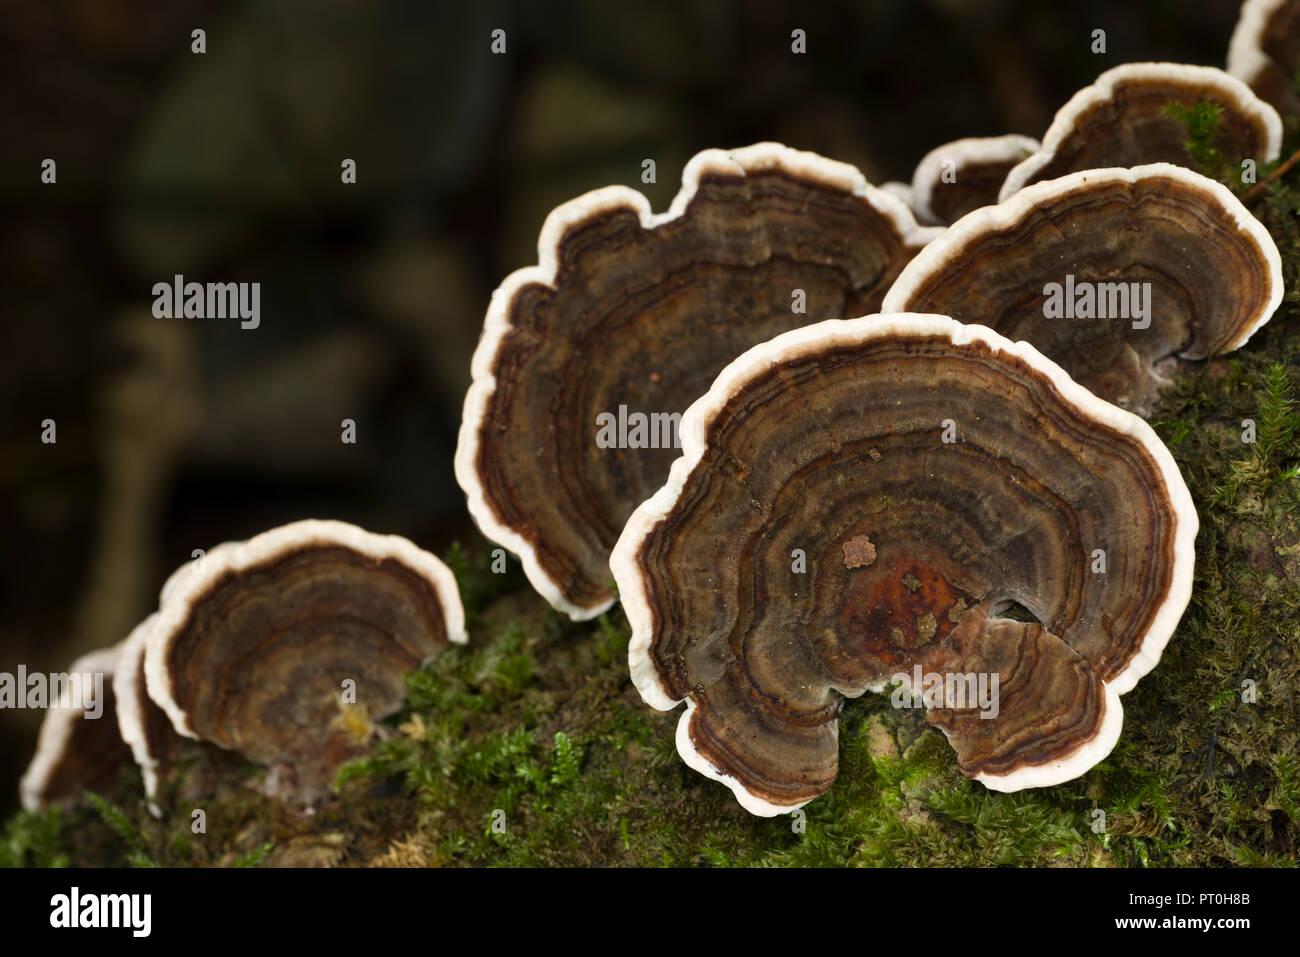 Turkey Tail (Trametes versicolor) shelf fungus. Goblin Combe, North Somerset, England. - Stock Image